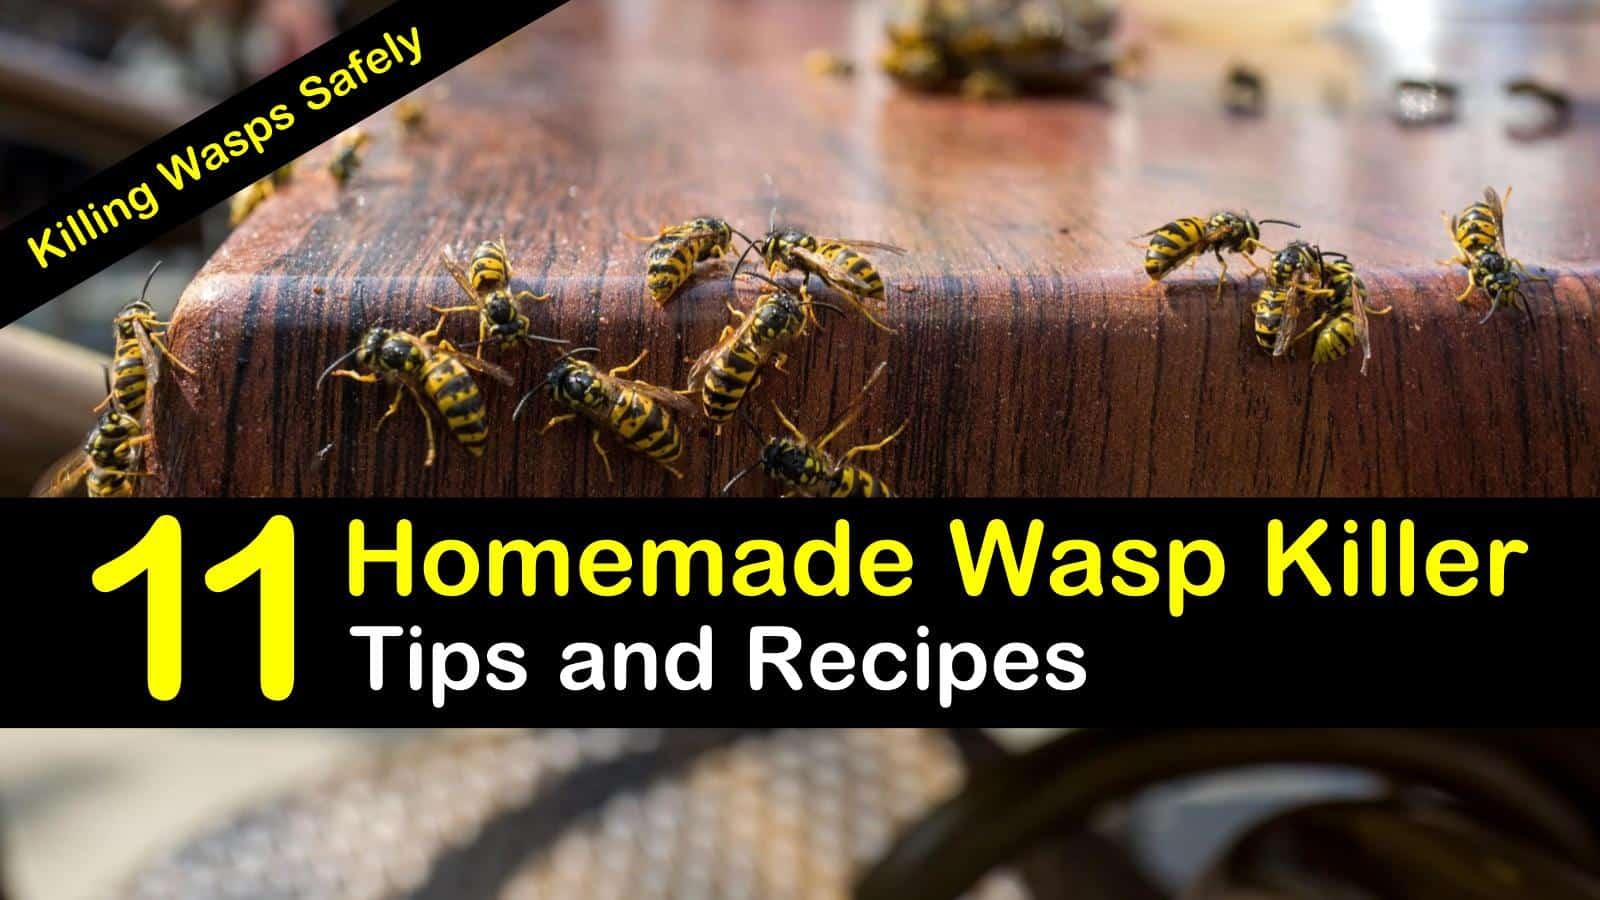 Killing Wasps Safely - 11 Homemade Wasp Killer Tips and Recipes